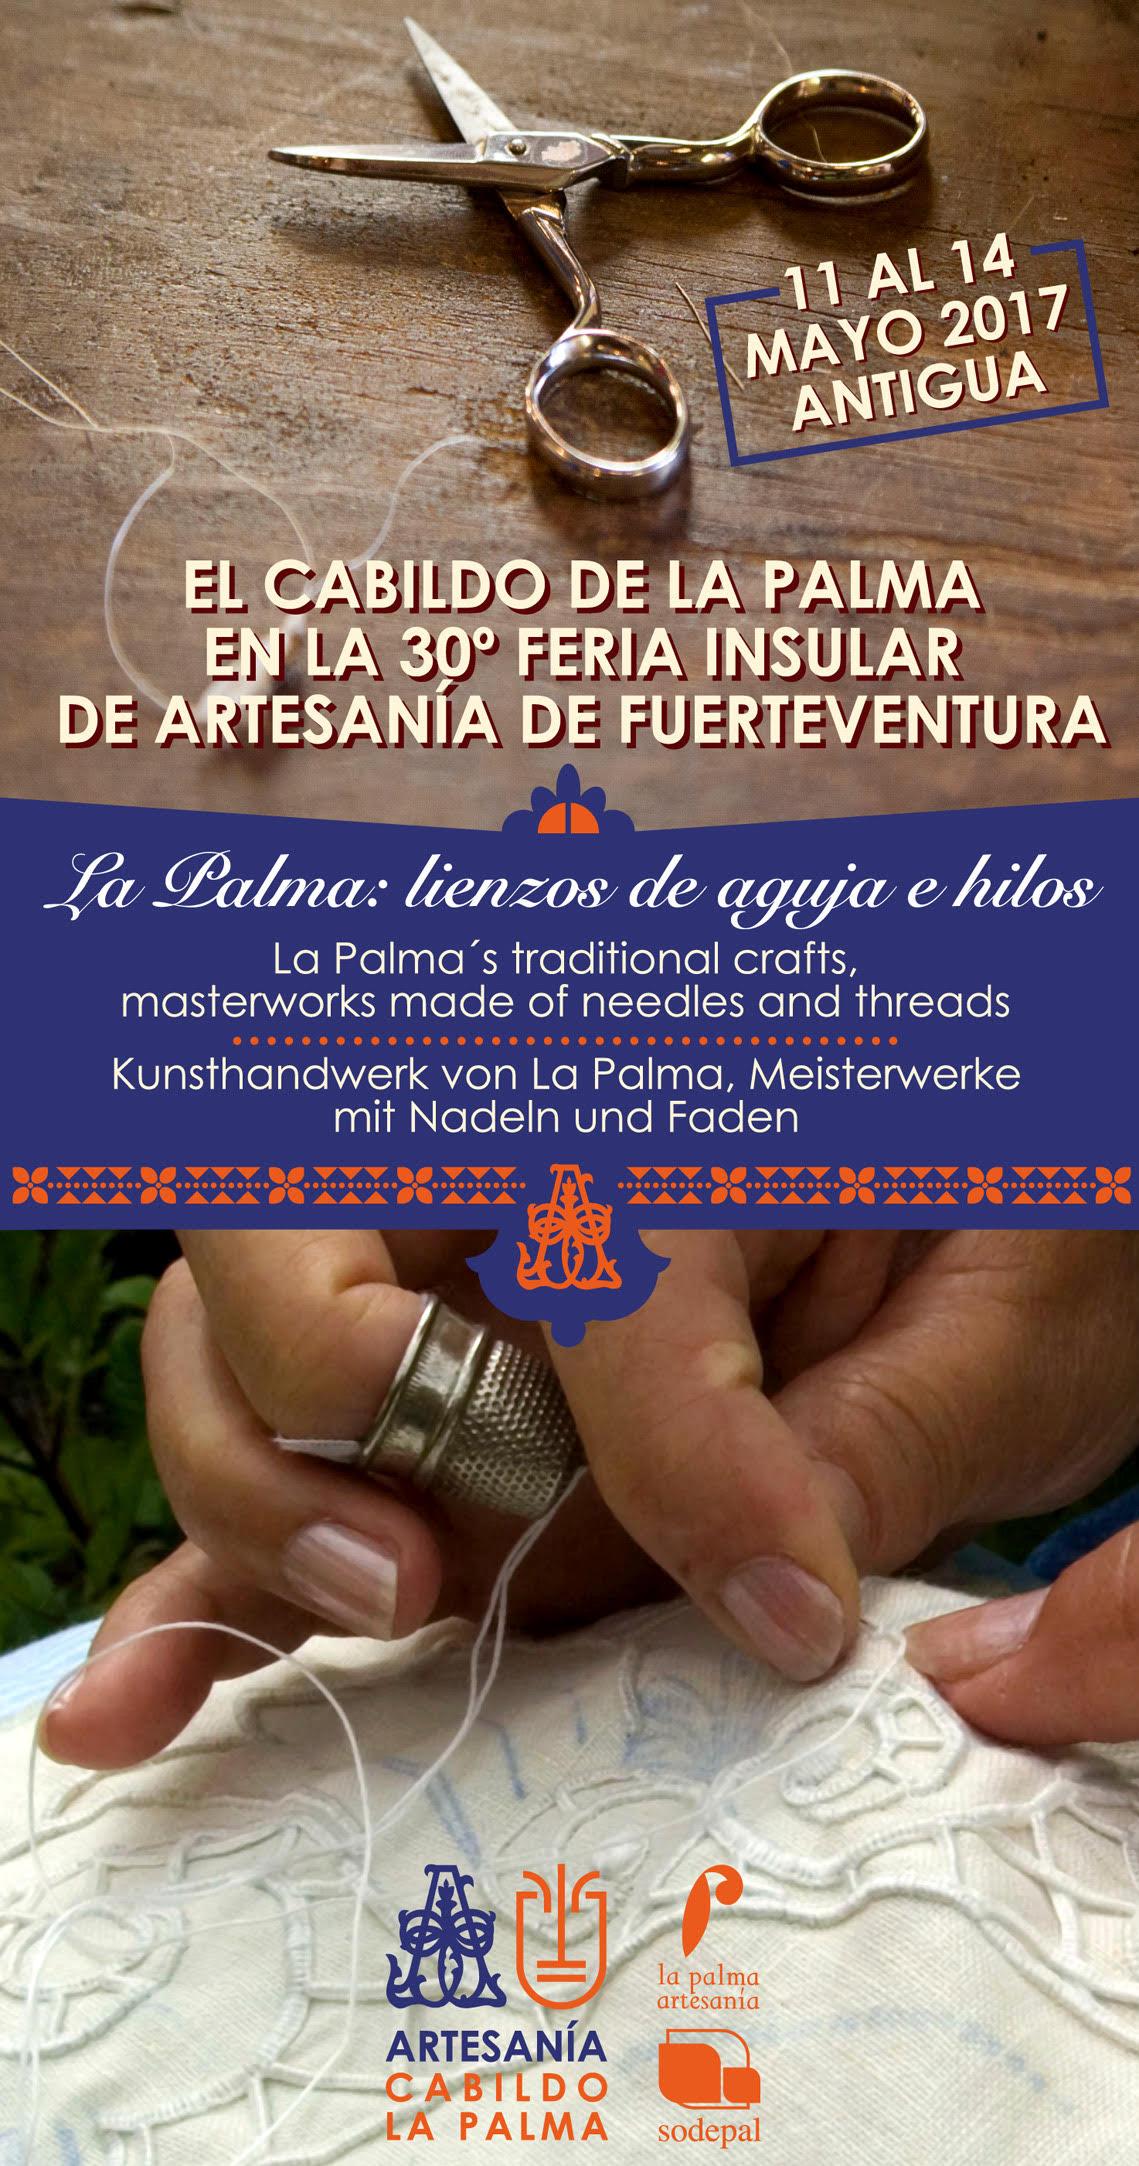 CARTEL LA PALMA EN XXX FERIA INSULAR DE ARTESANIA DE FUERTEVENTURA - LIENZOS DE AGUJA E HILOS